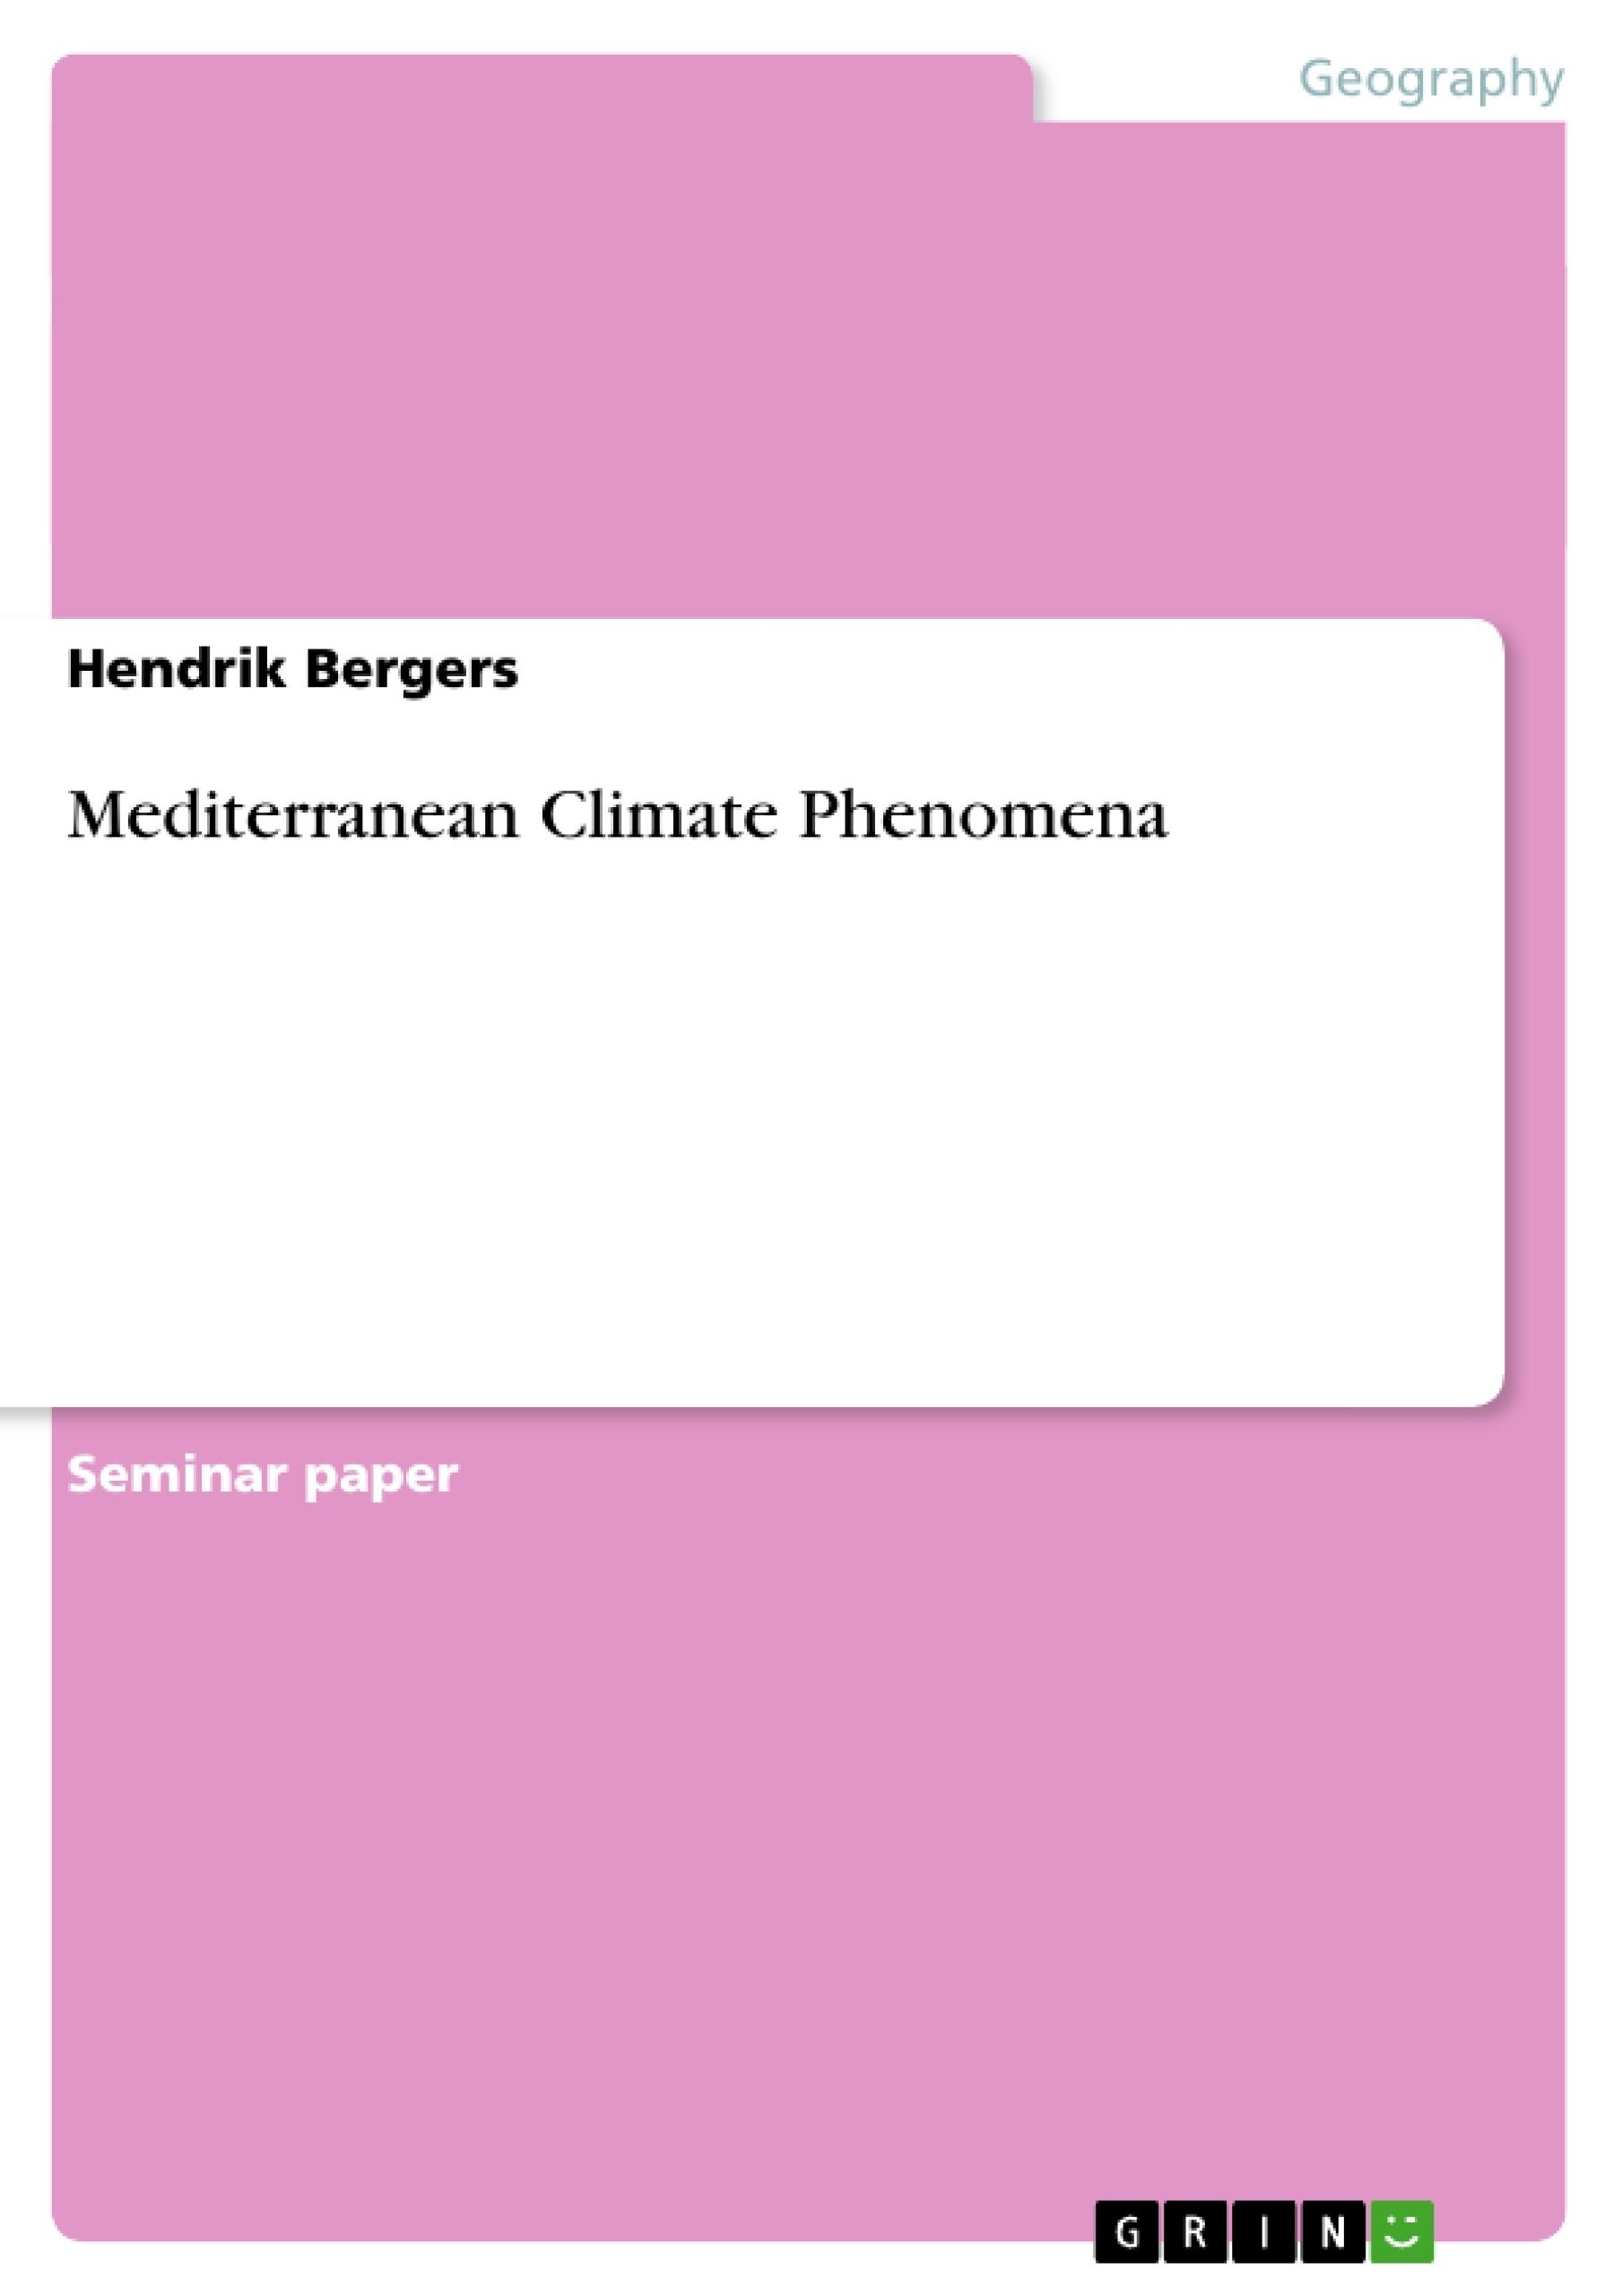 Title: Mediterranean Climate Phenomena